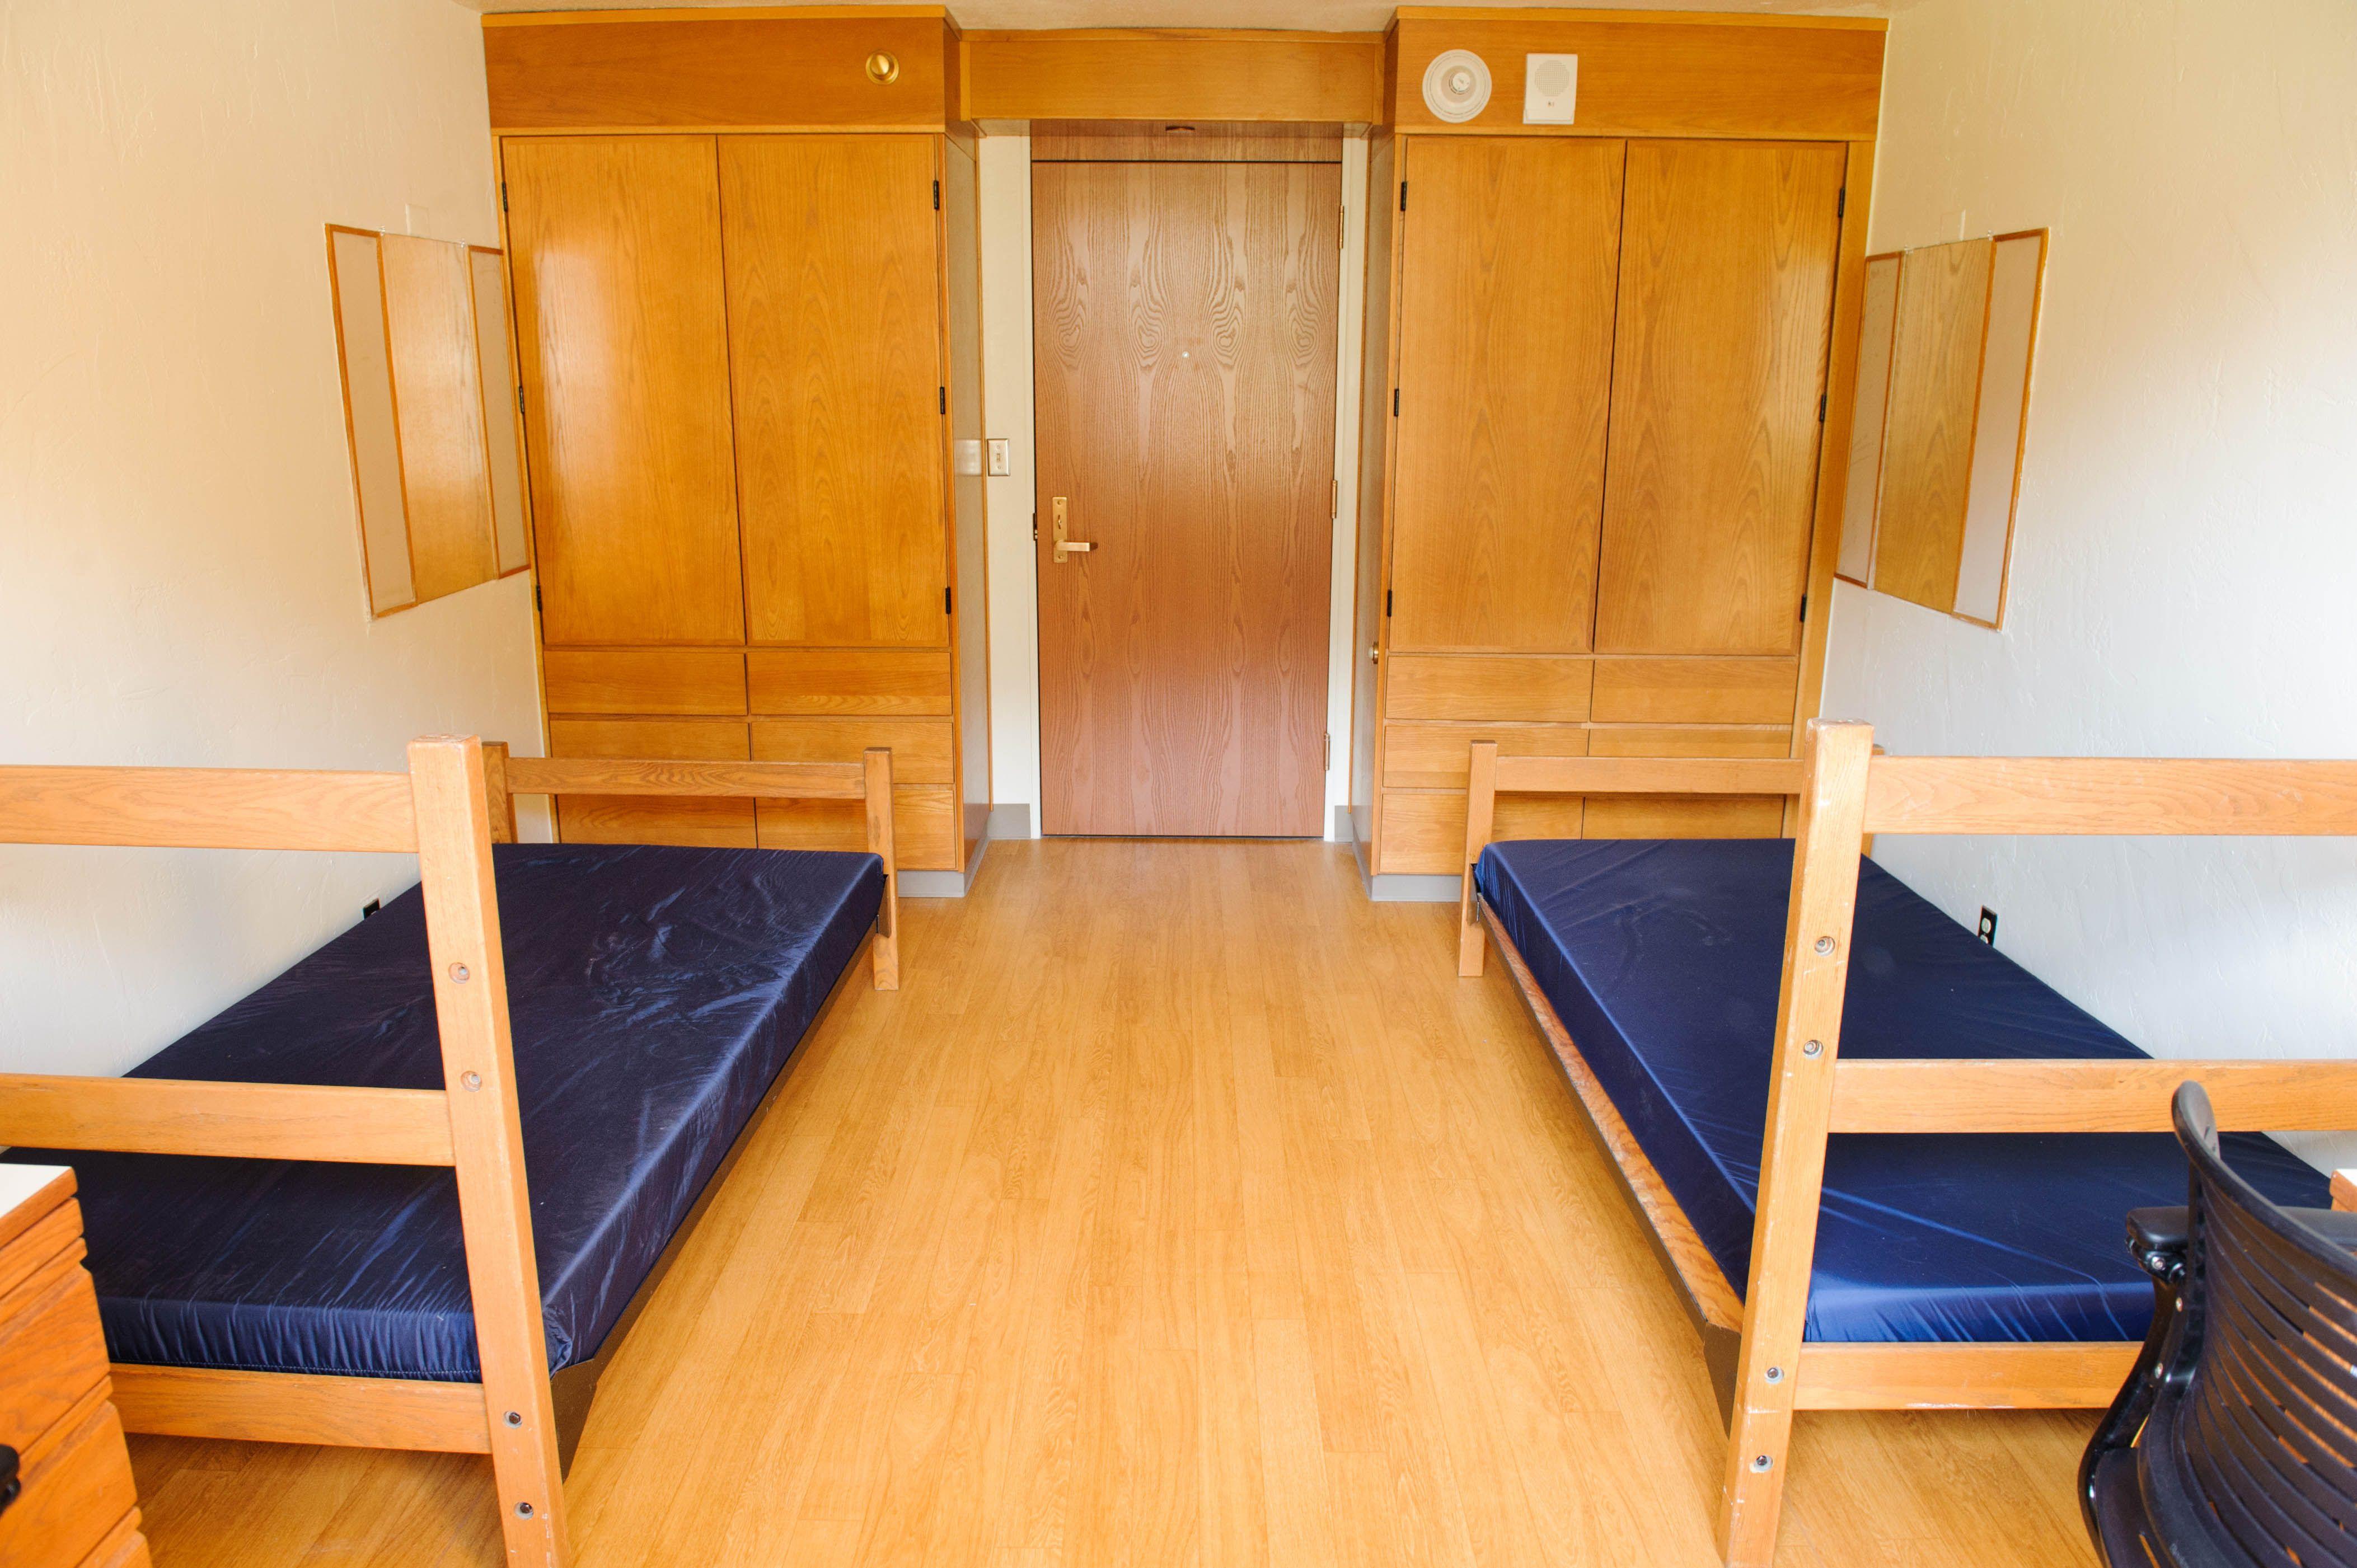 Back-to-School: Dorm Room Essentials – The Bedding Snob |Empty Dorm Room